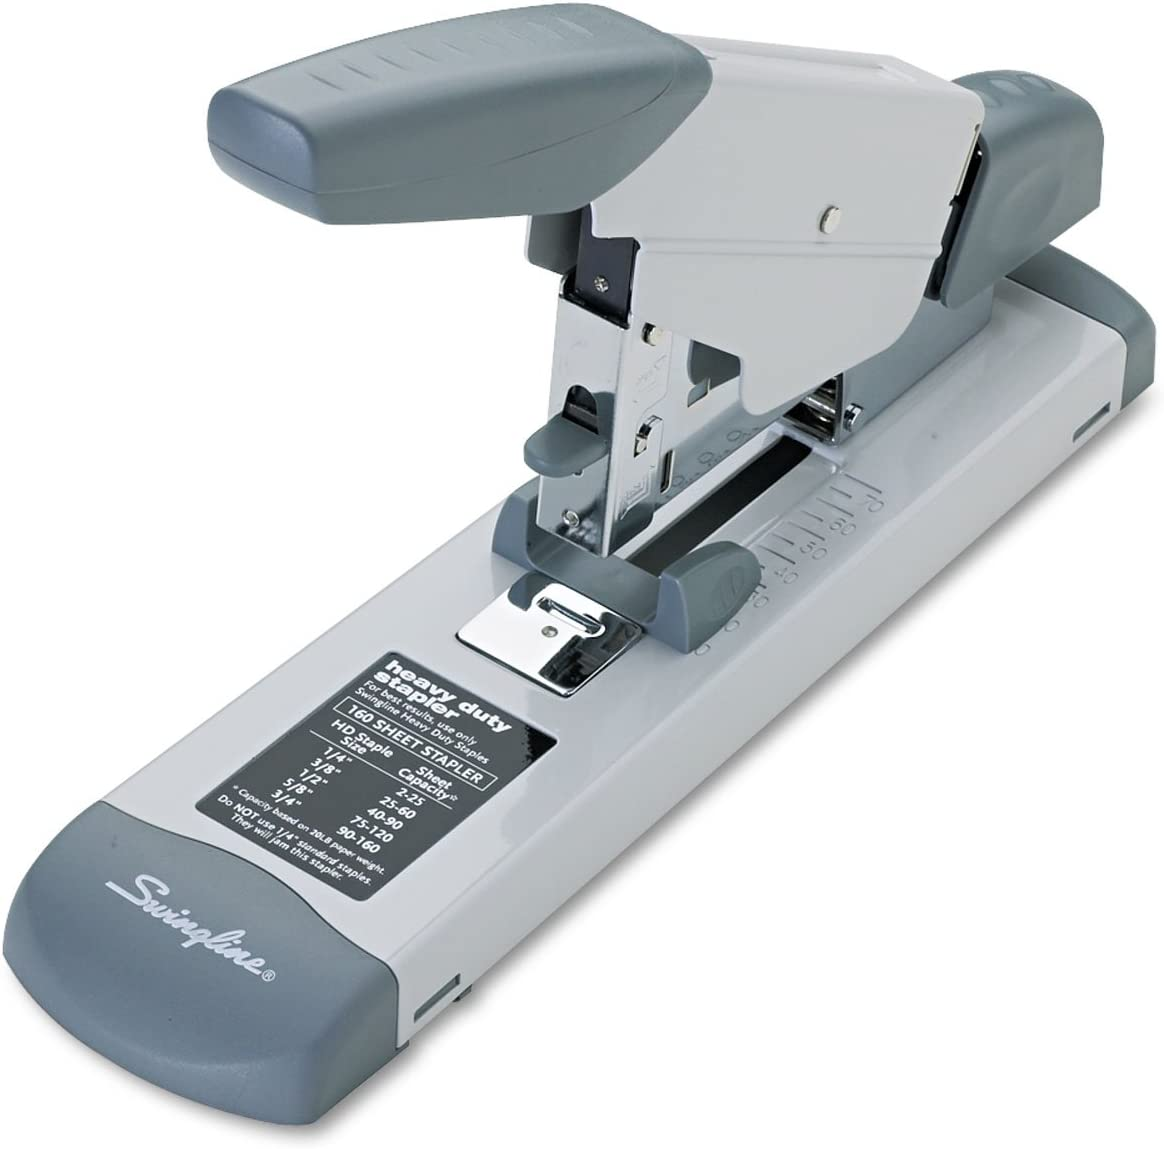 Swingline 39002 Deluxe Heavy-Duty Stapler 160-Sheet Capacity Platinum : Office Products